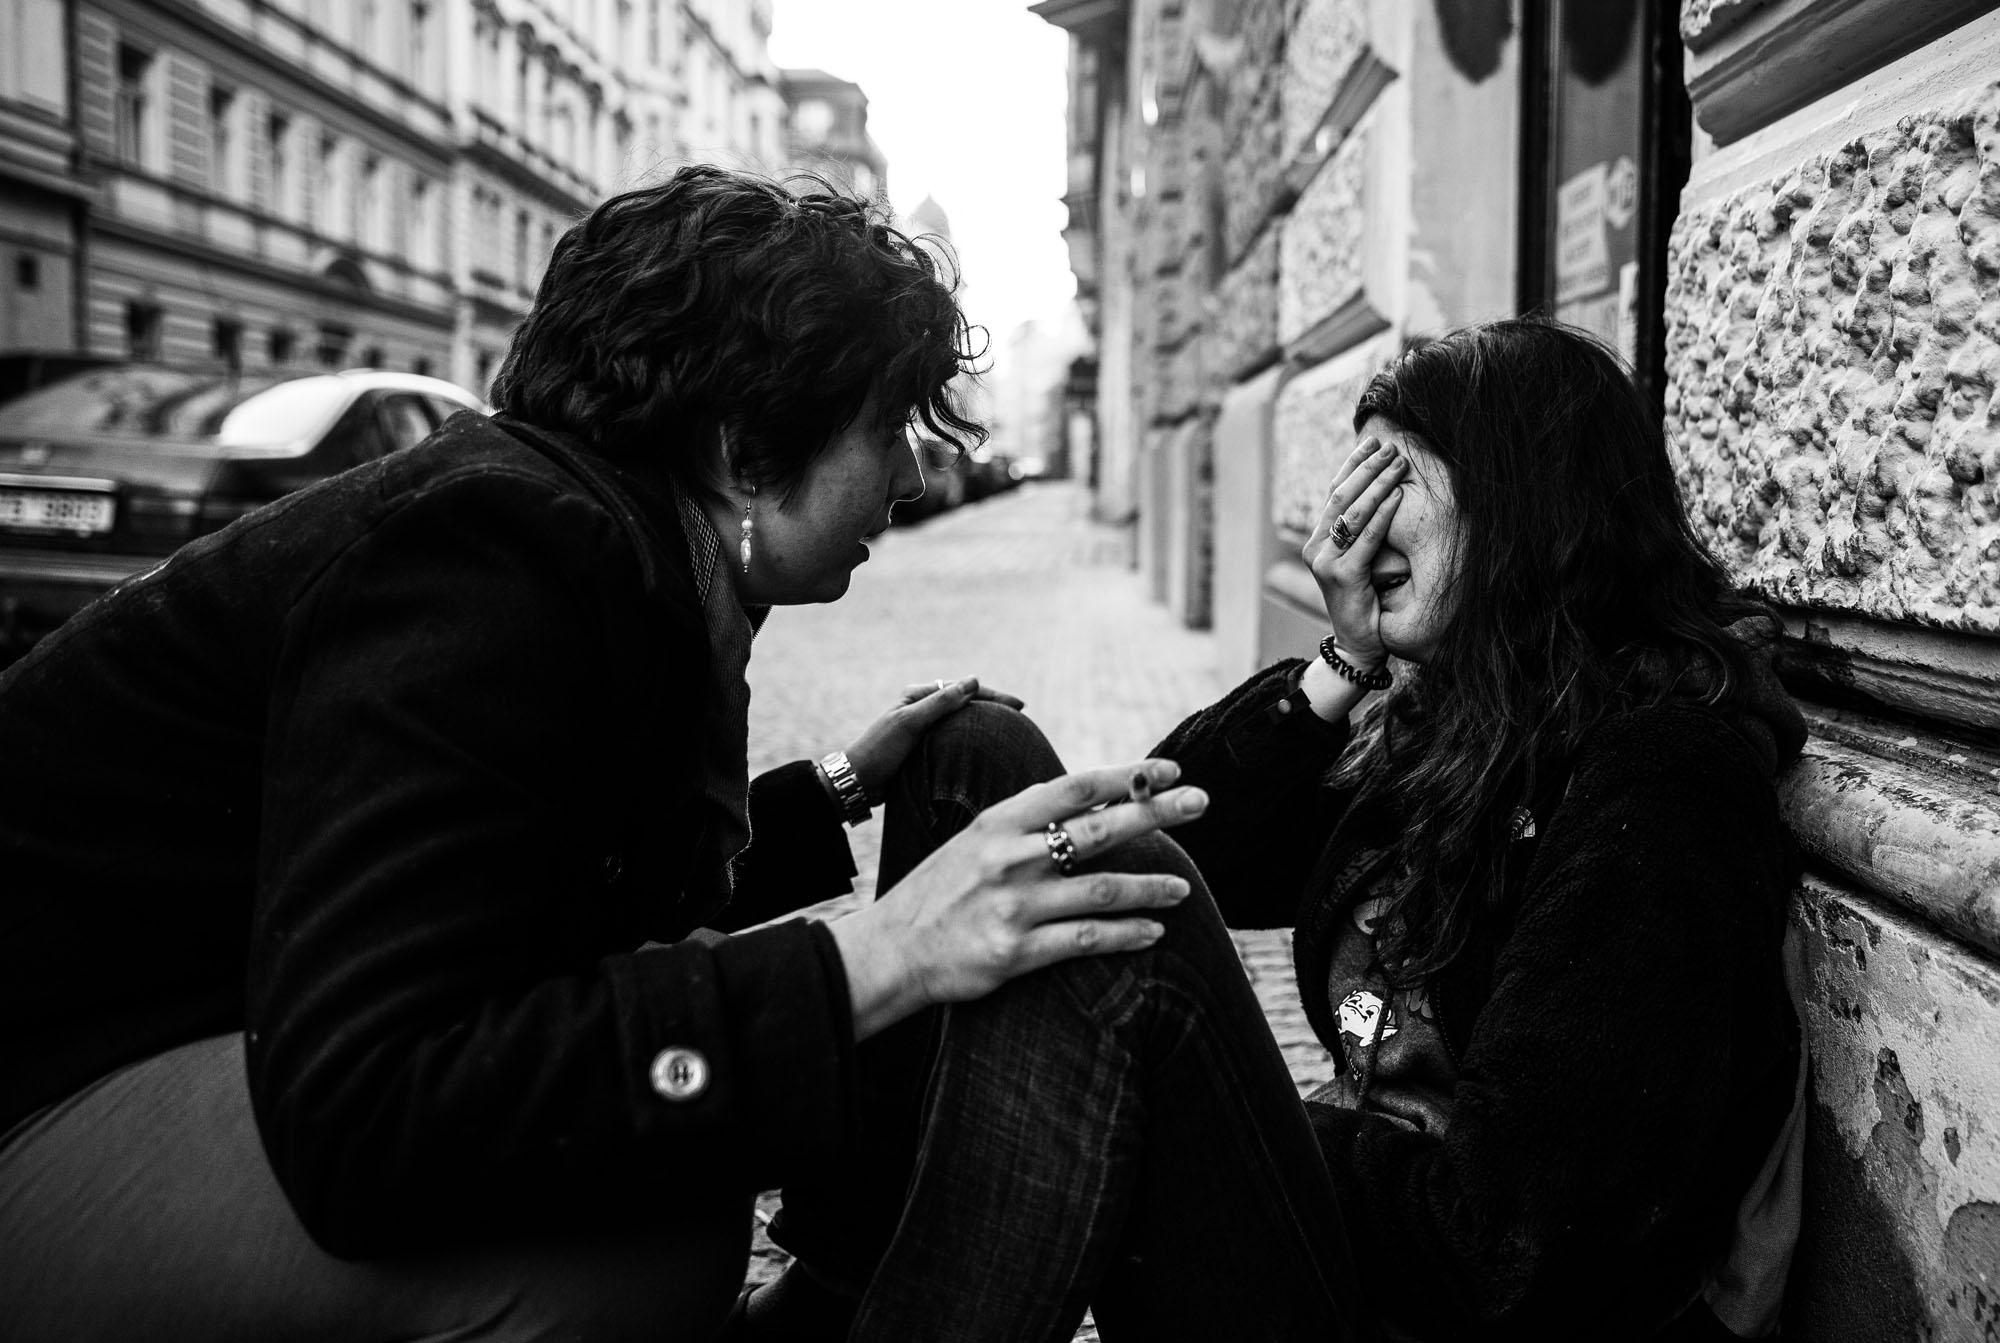 david tesinsky street american subculture photographer around prague subcultures